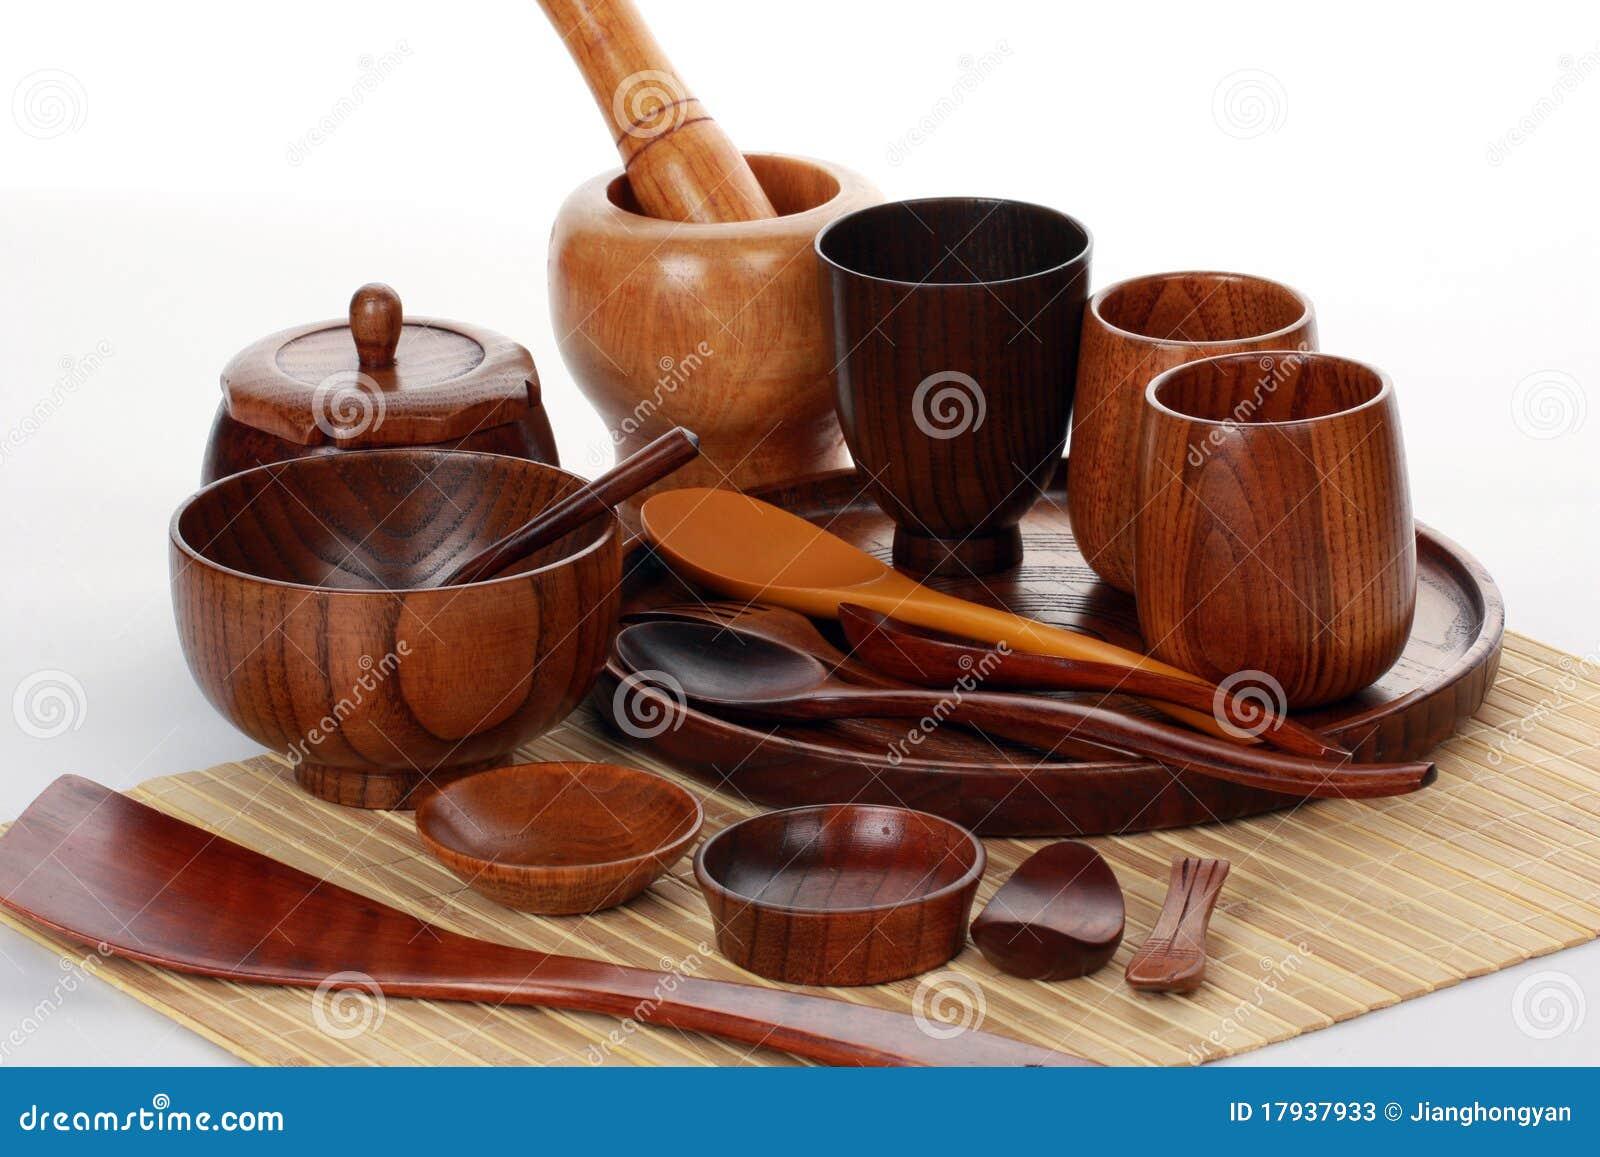 Wood craft business plan template